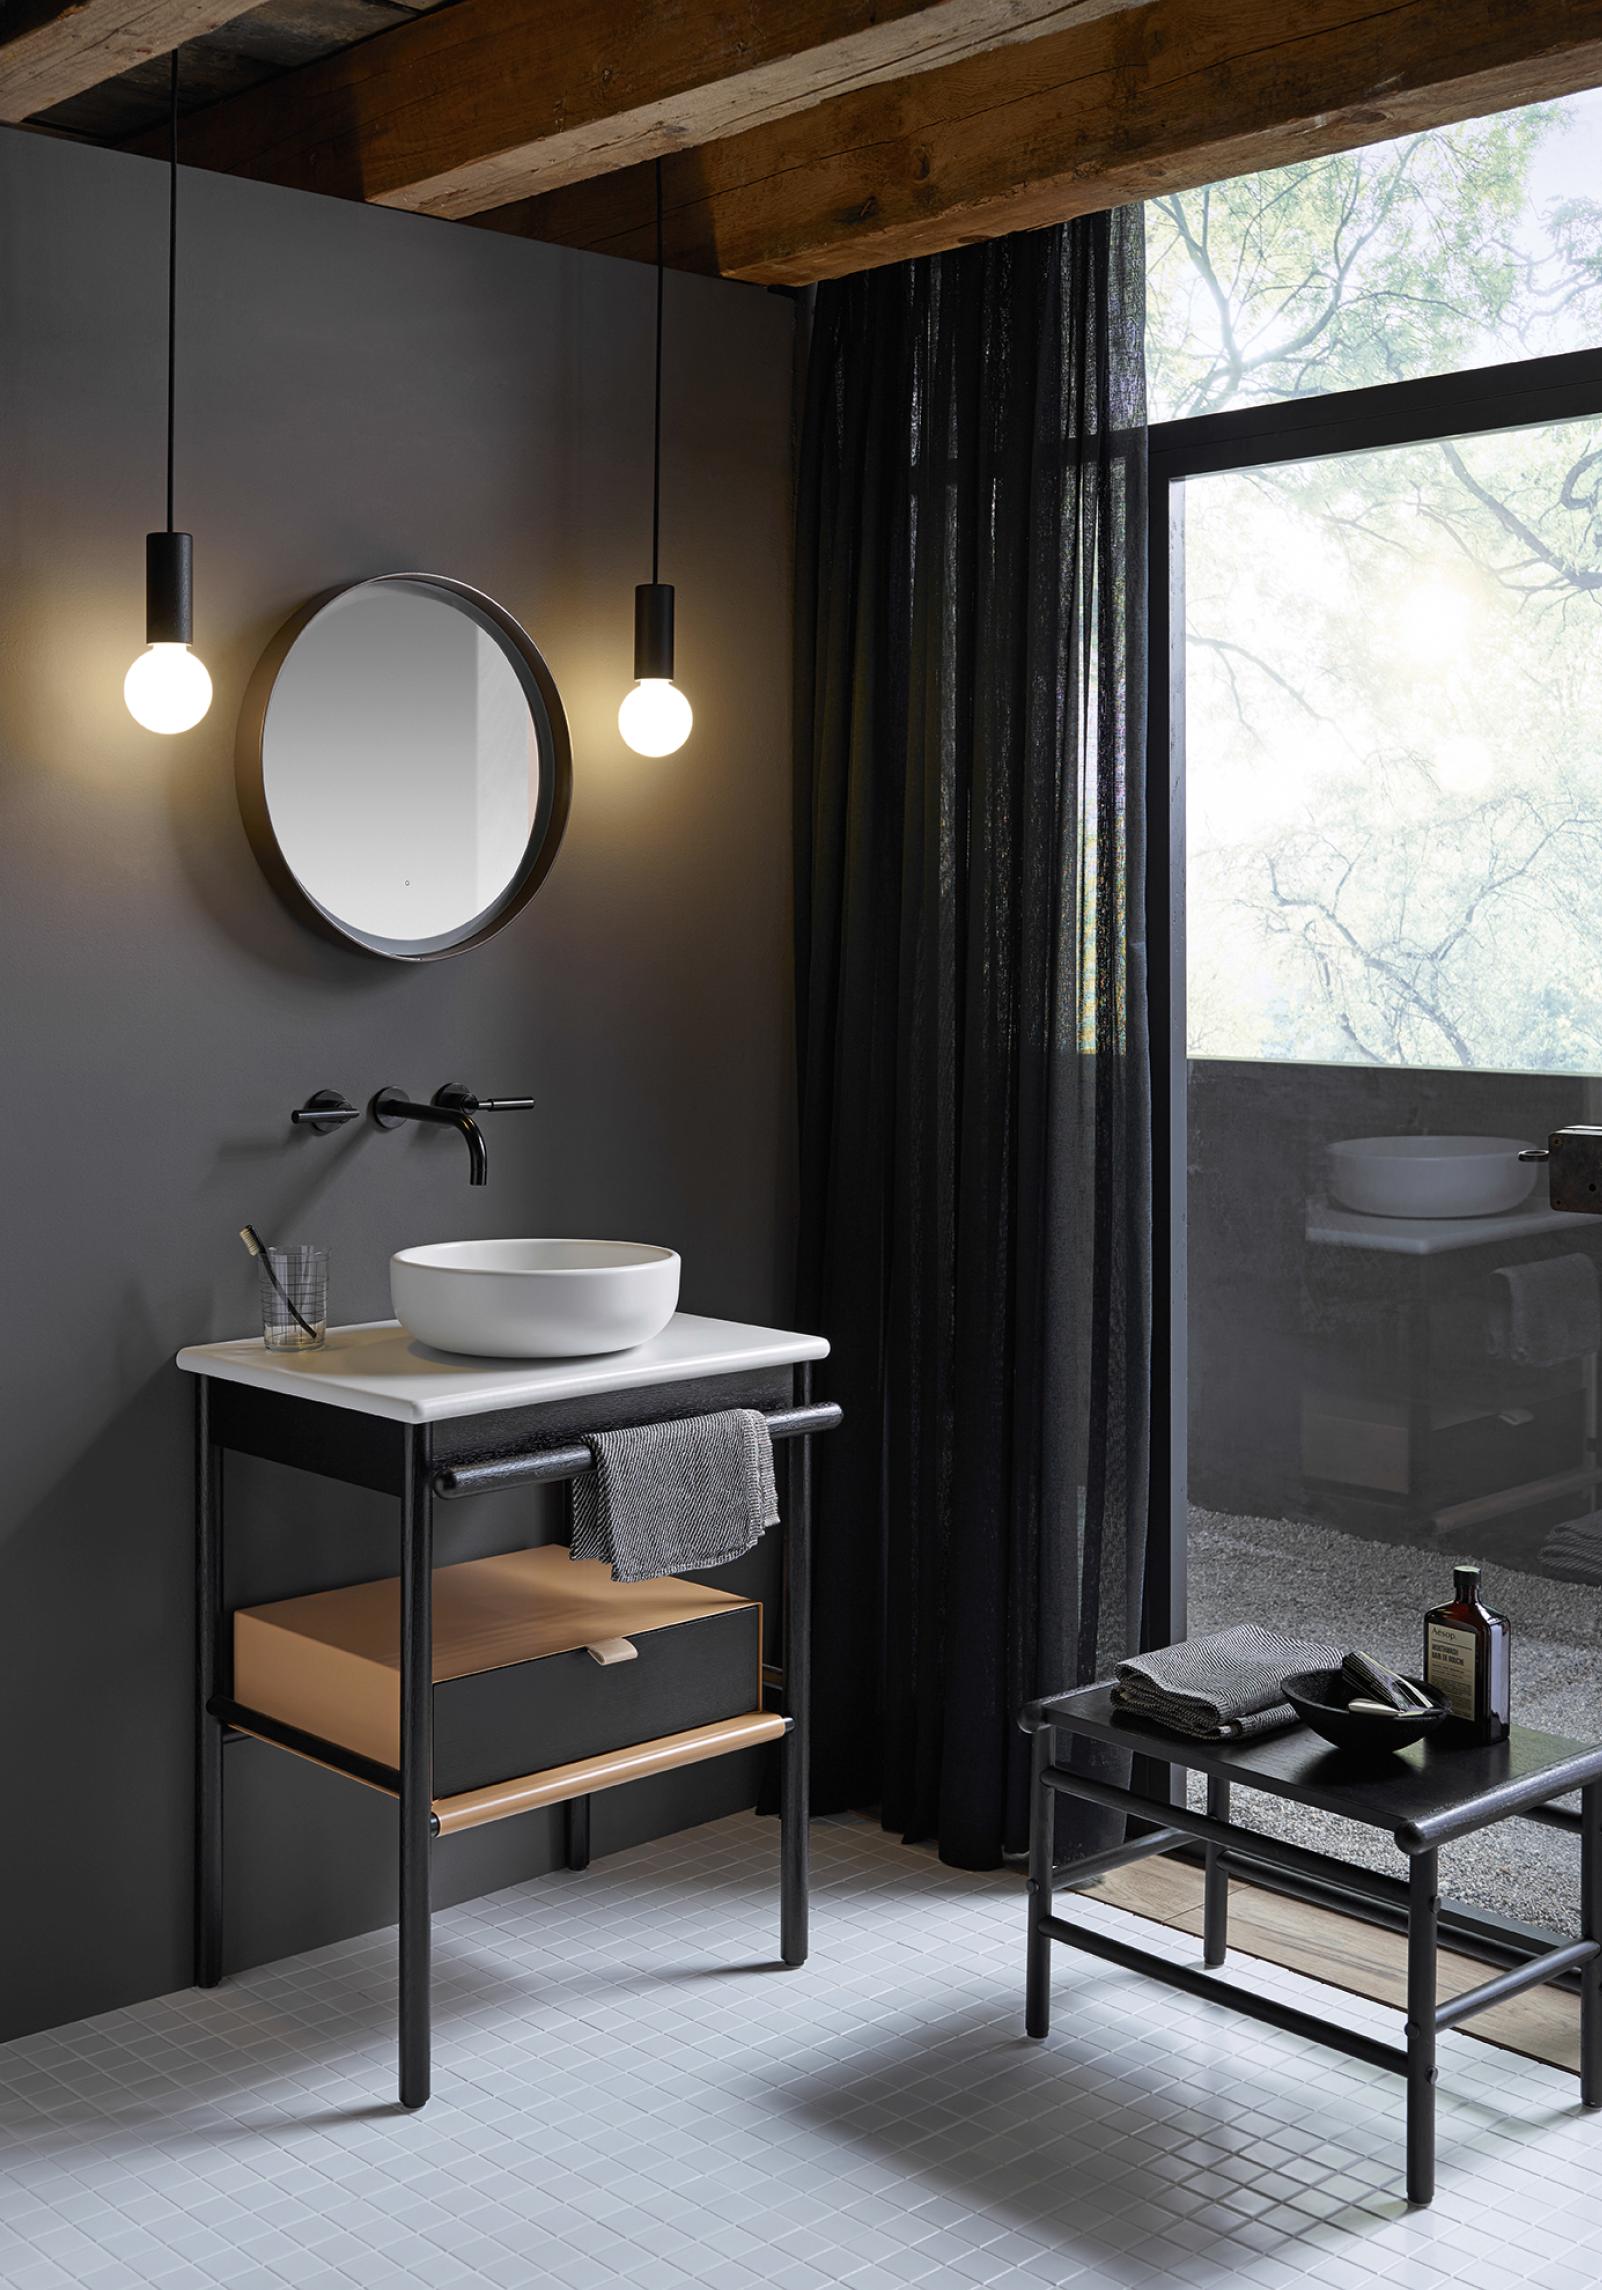 Mya design Studio Altherr for Burgbad for small bathrooms